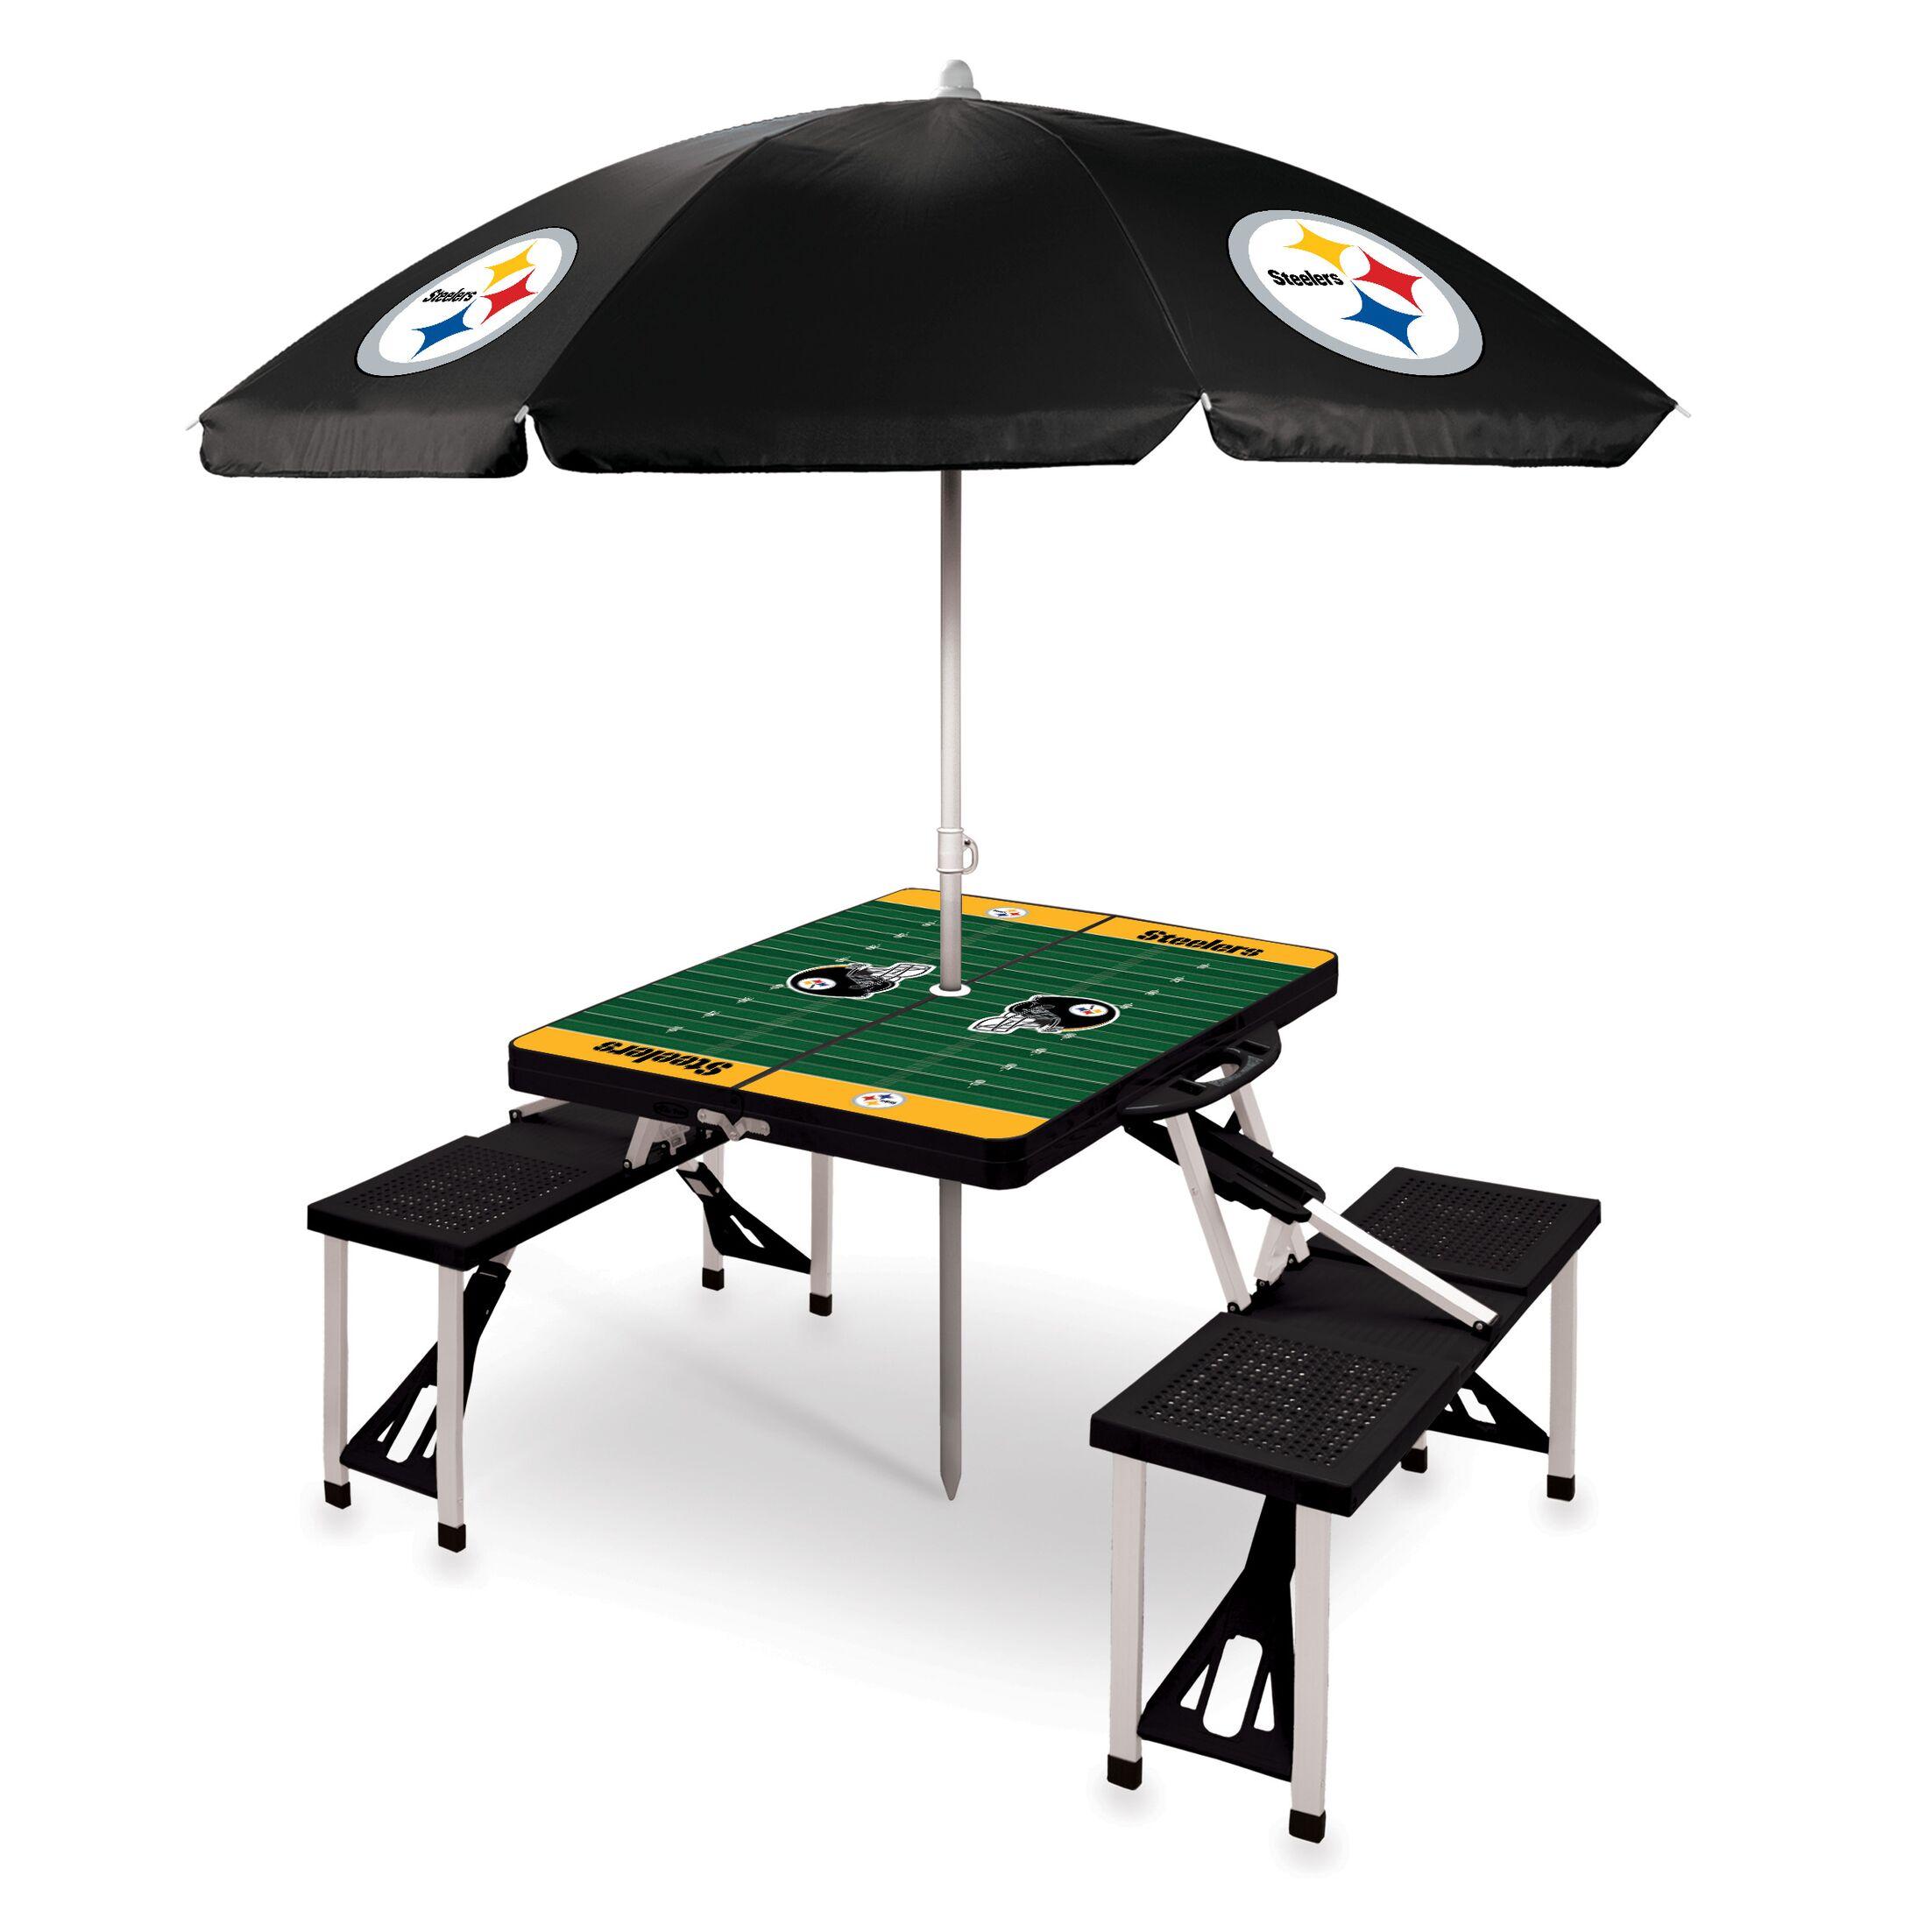 Picnic Table NFL Team: Pittsburgh Steelers/black